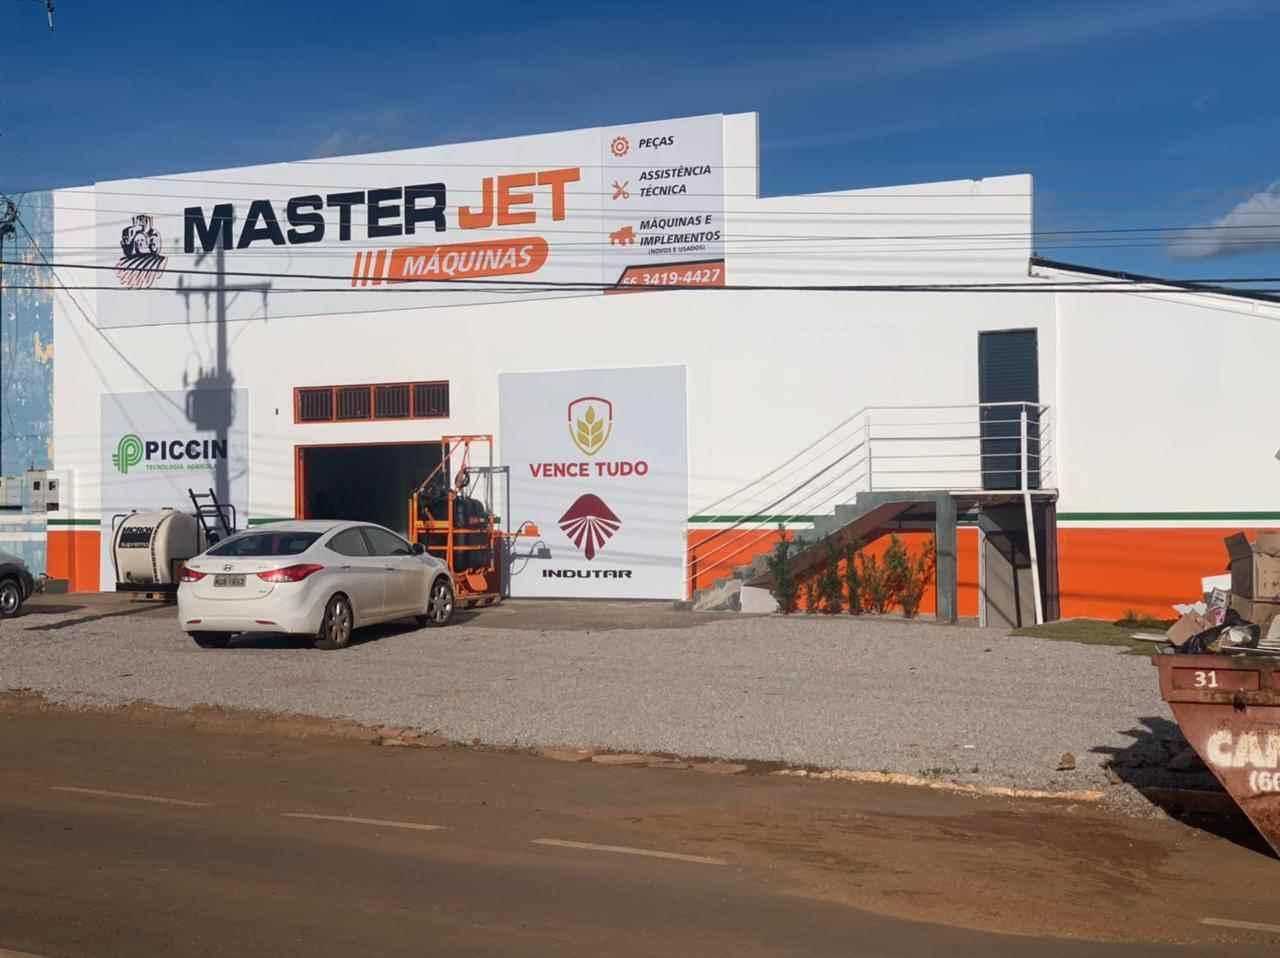 Foto da Loja da Master Jet Máquinas